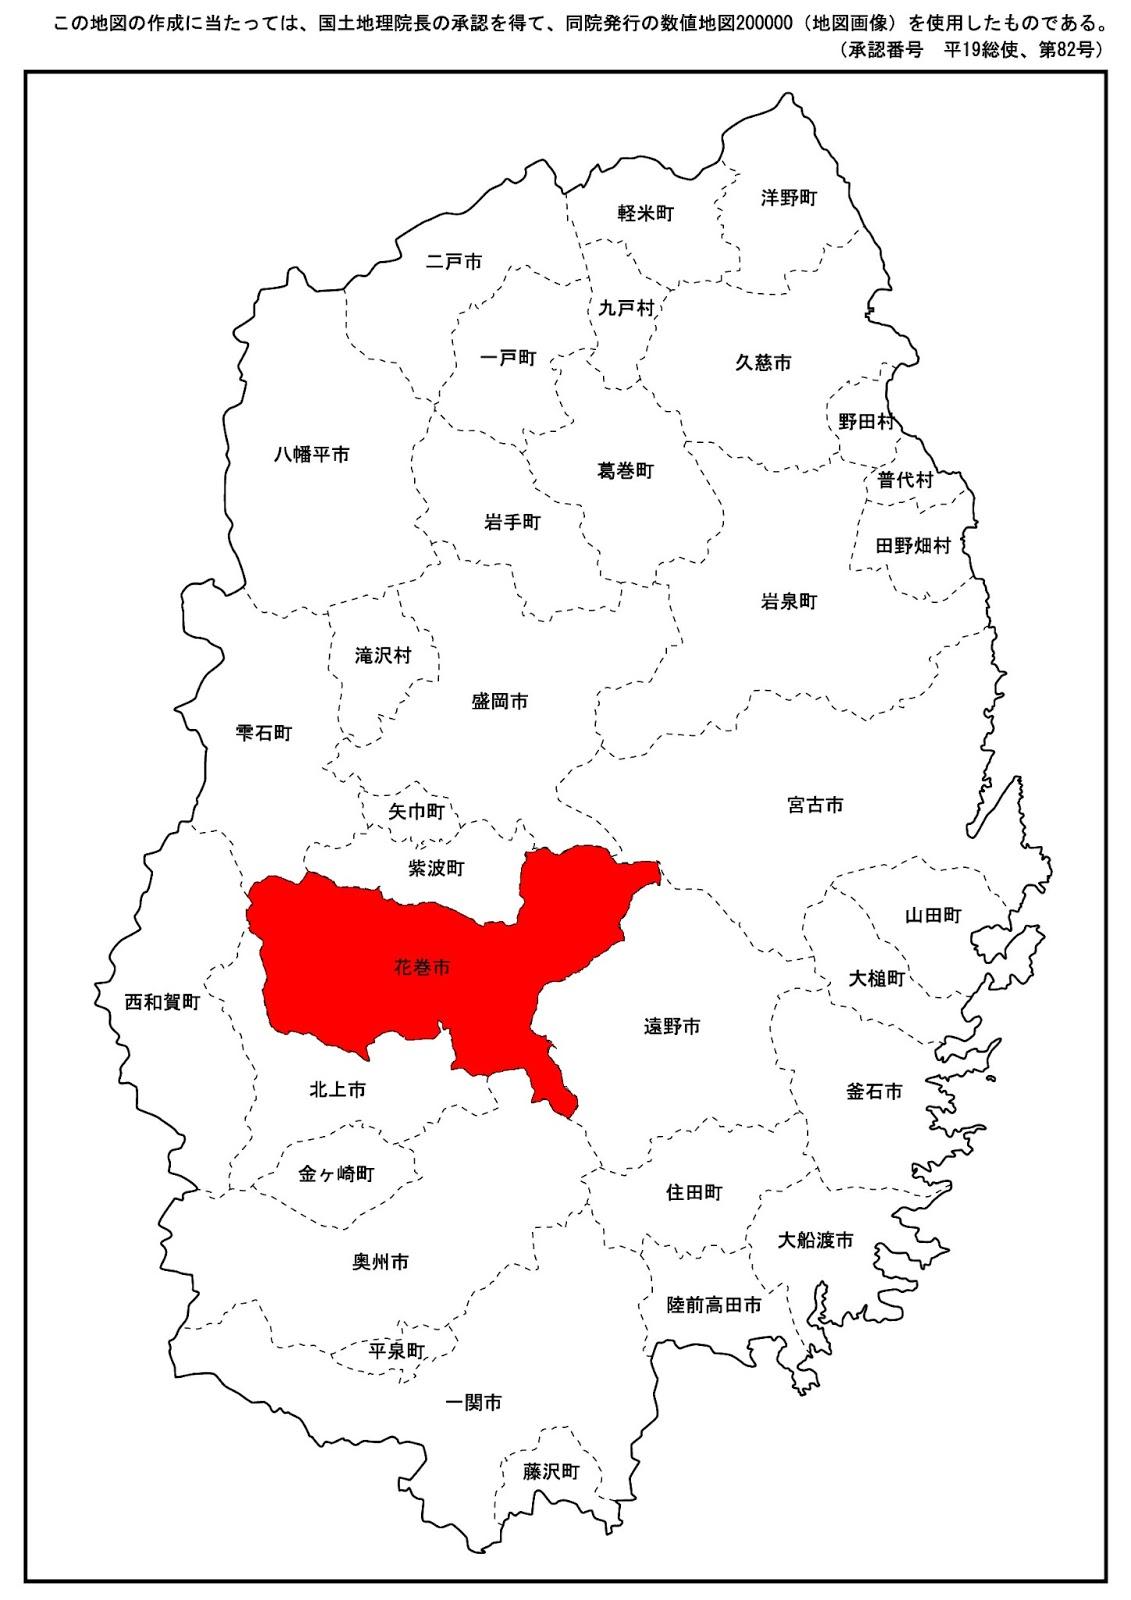 dryascw: ファースト花巻市 (JCC0307) JA7DLE